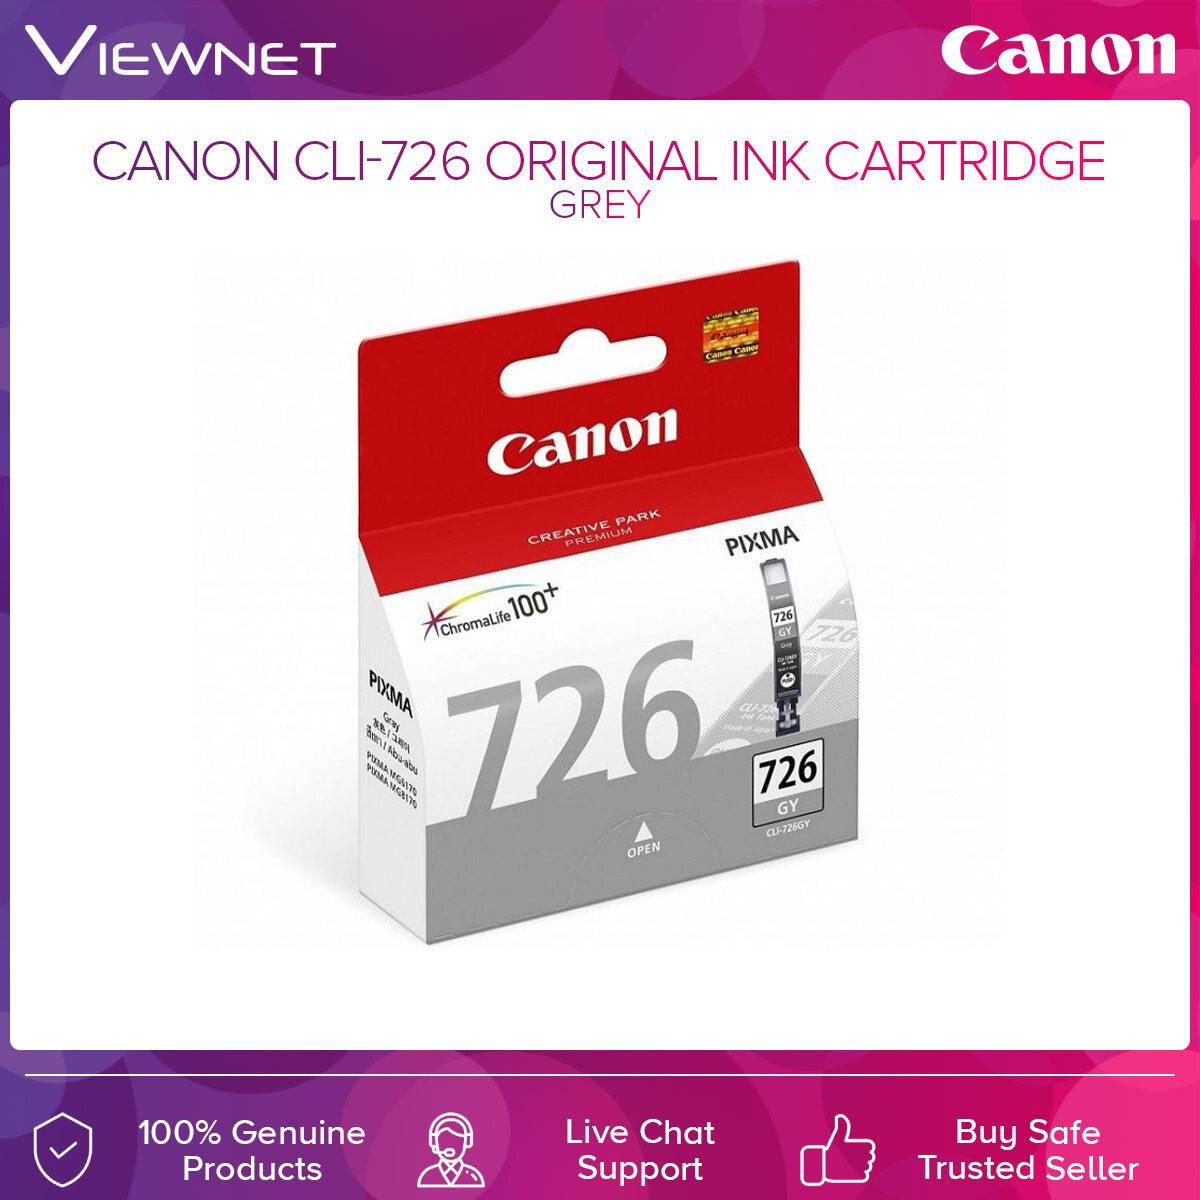 Canon PGI 725 / CLI 726 Original Ink Cartridge Black Cyan Magenta Yellow Grey